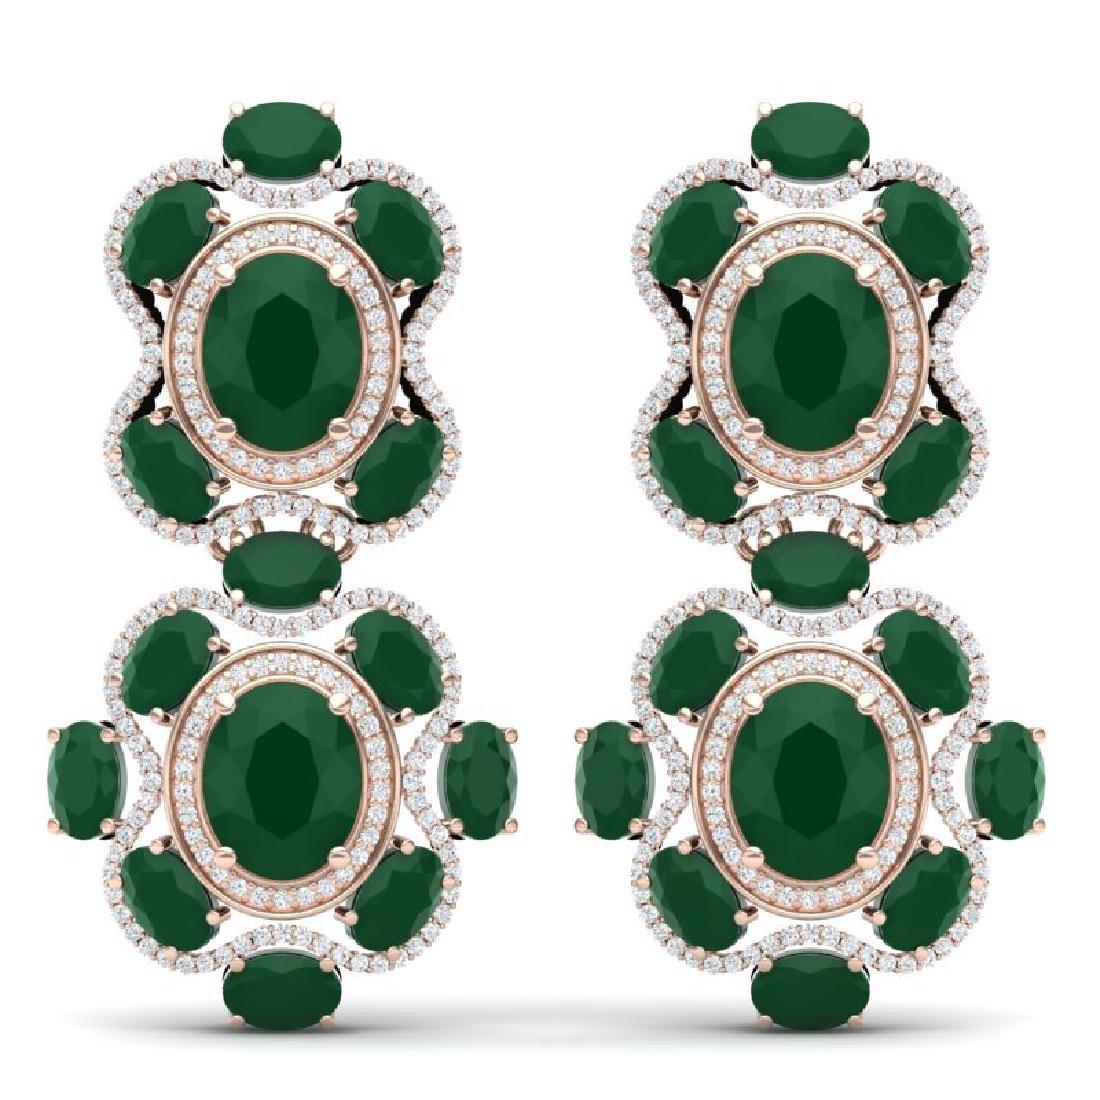 33.5 CTW Royalty Emerald & VS Diamond Earrings 18K Rose